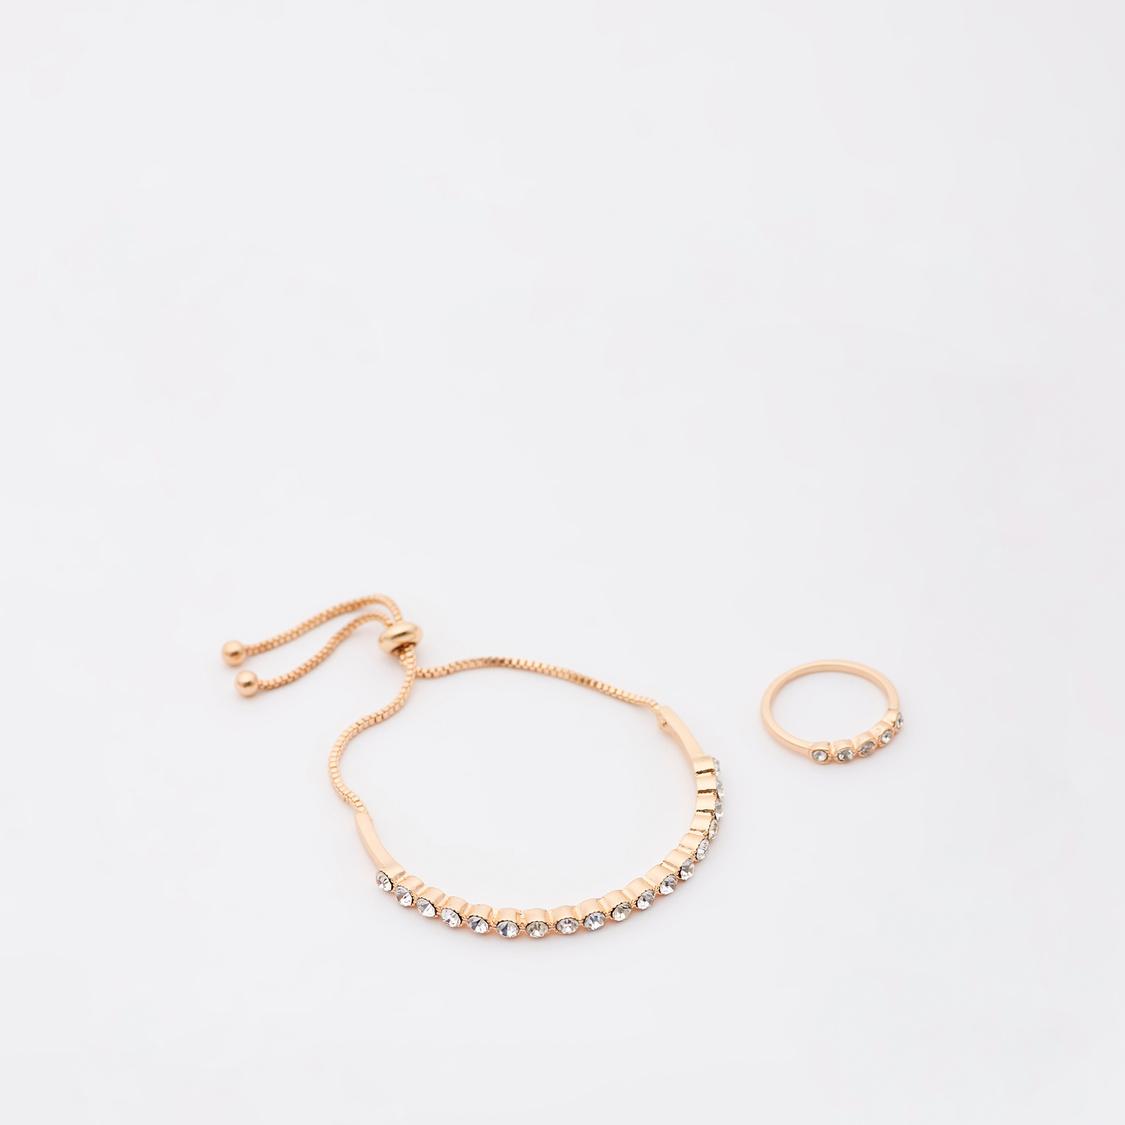 طقم خاتم وسوار مرصع قابل للتعديل